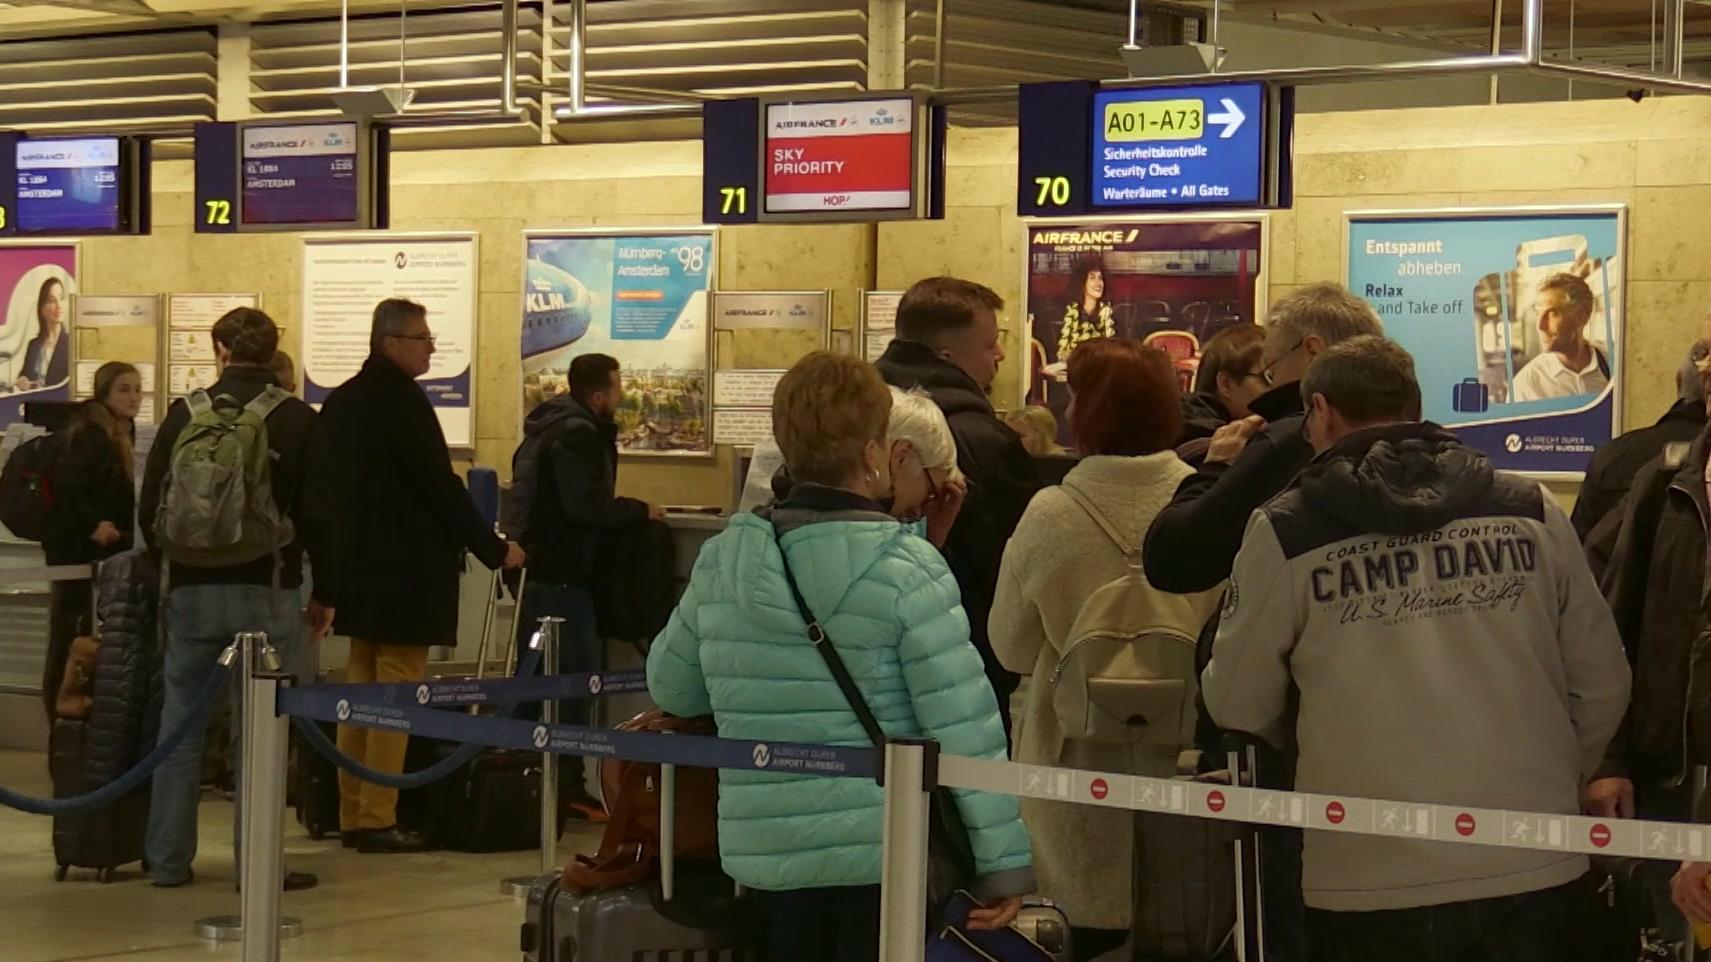 Wartende Passagiere am Flughafen Nürnberg